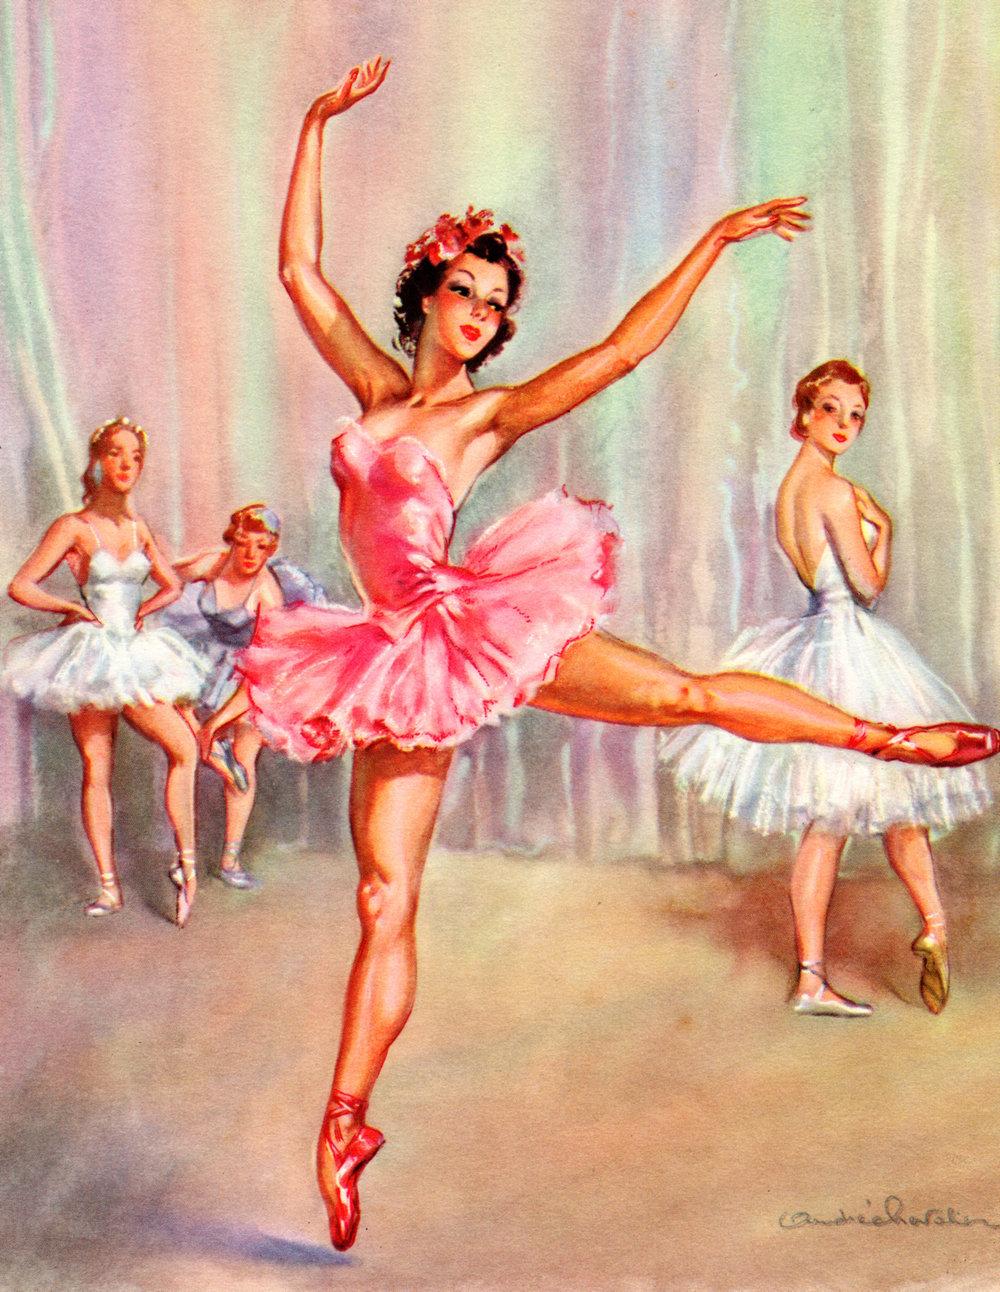 Ballet, Dance, Music & The Arts